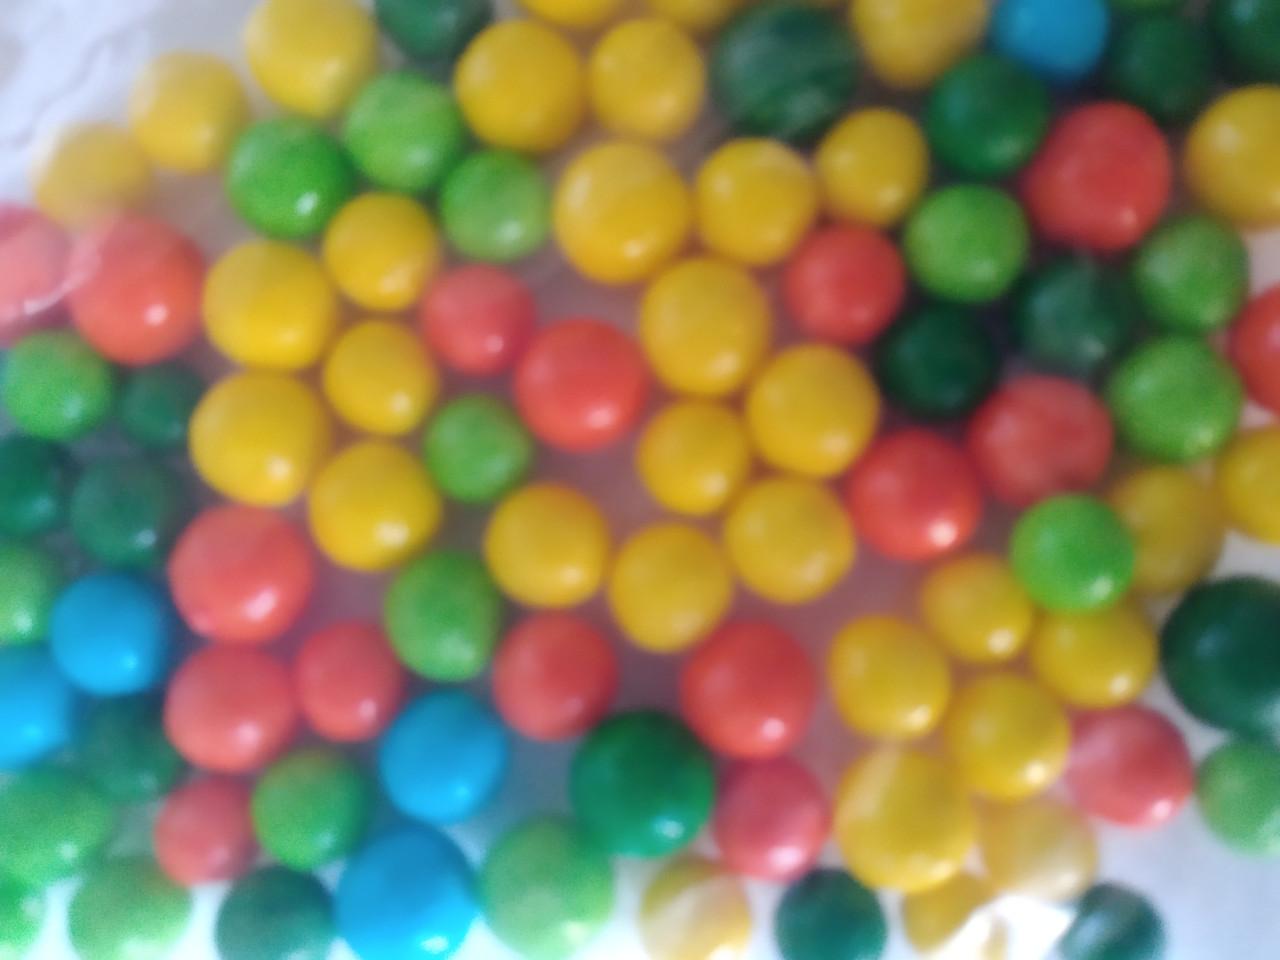 Шарики глянцевые D-10мм  сумм №2 (,050 грм)